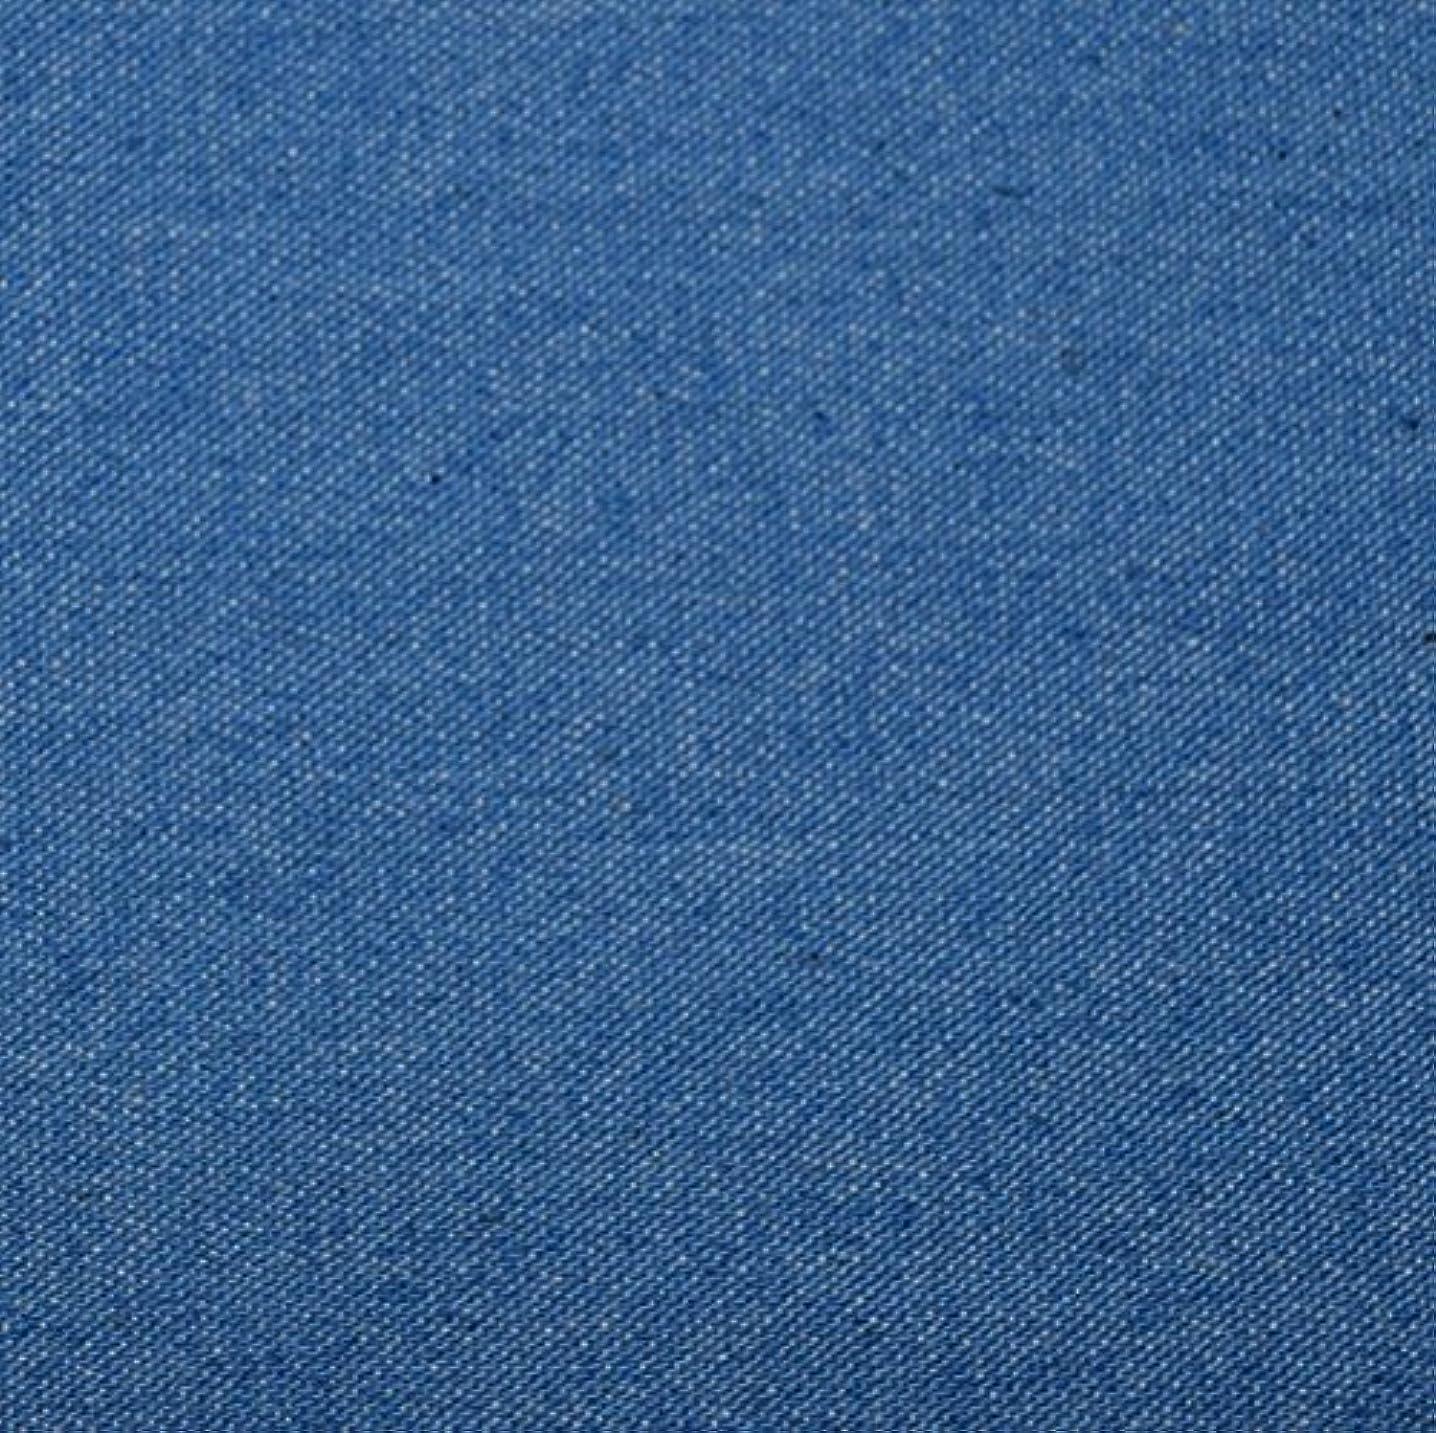 8 oz Stretch Cotton Denim Fabric by the yard - Light Blue